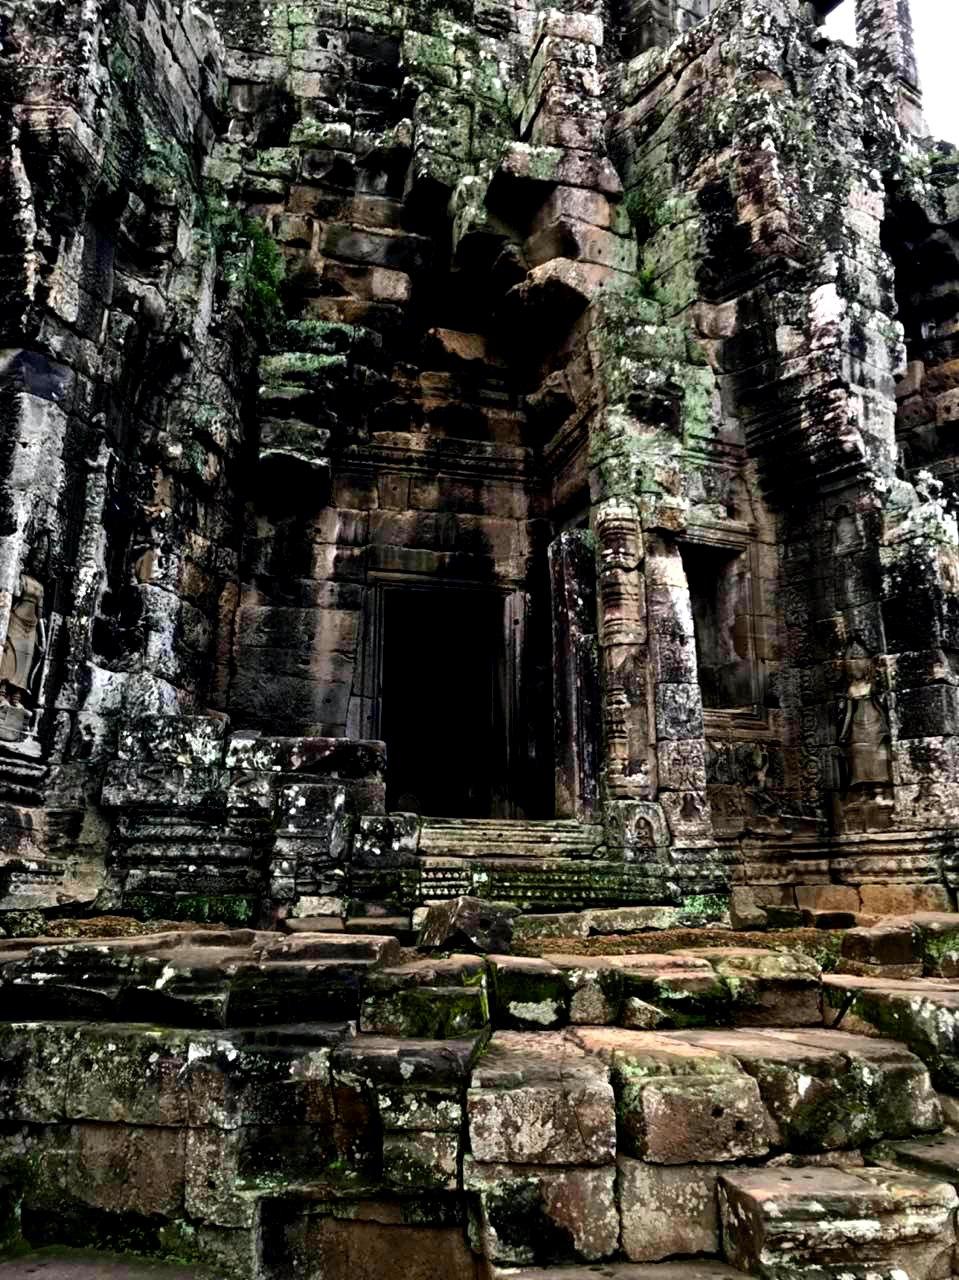 Елена Руденко (Валтея). Камбоджа. Ангкор. P5k78M32oEg